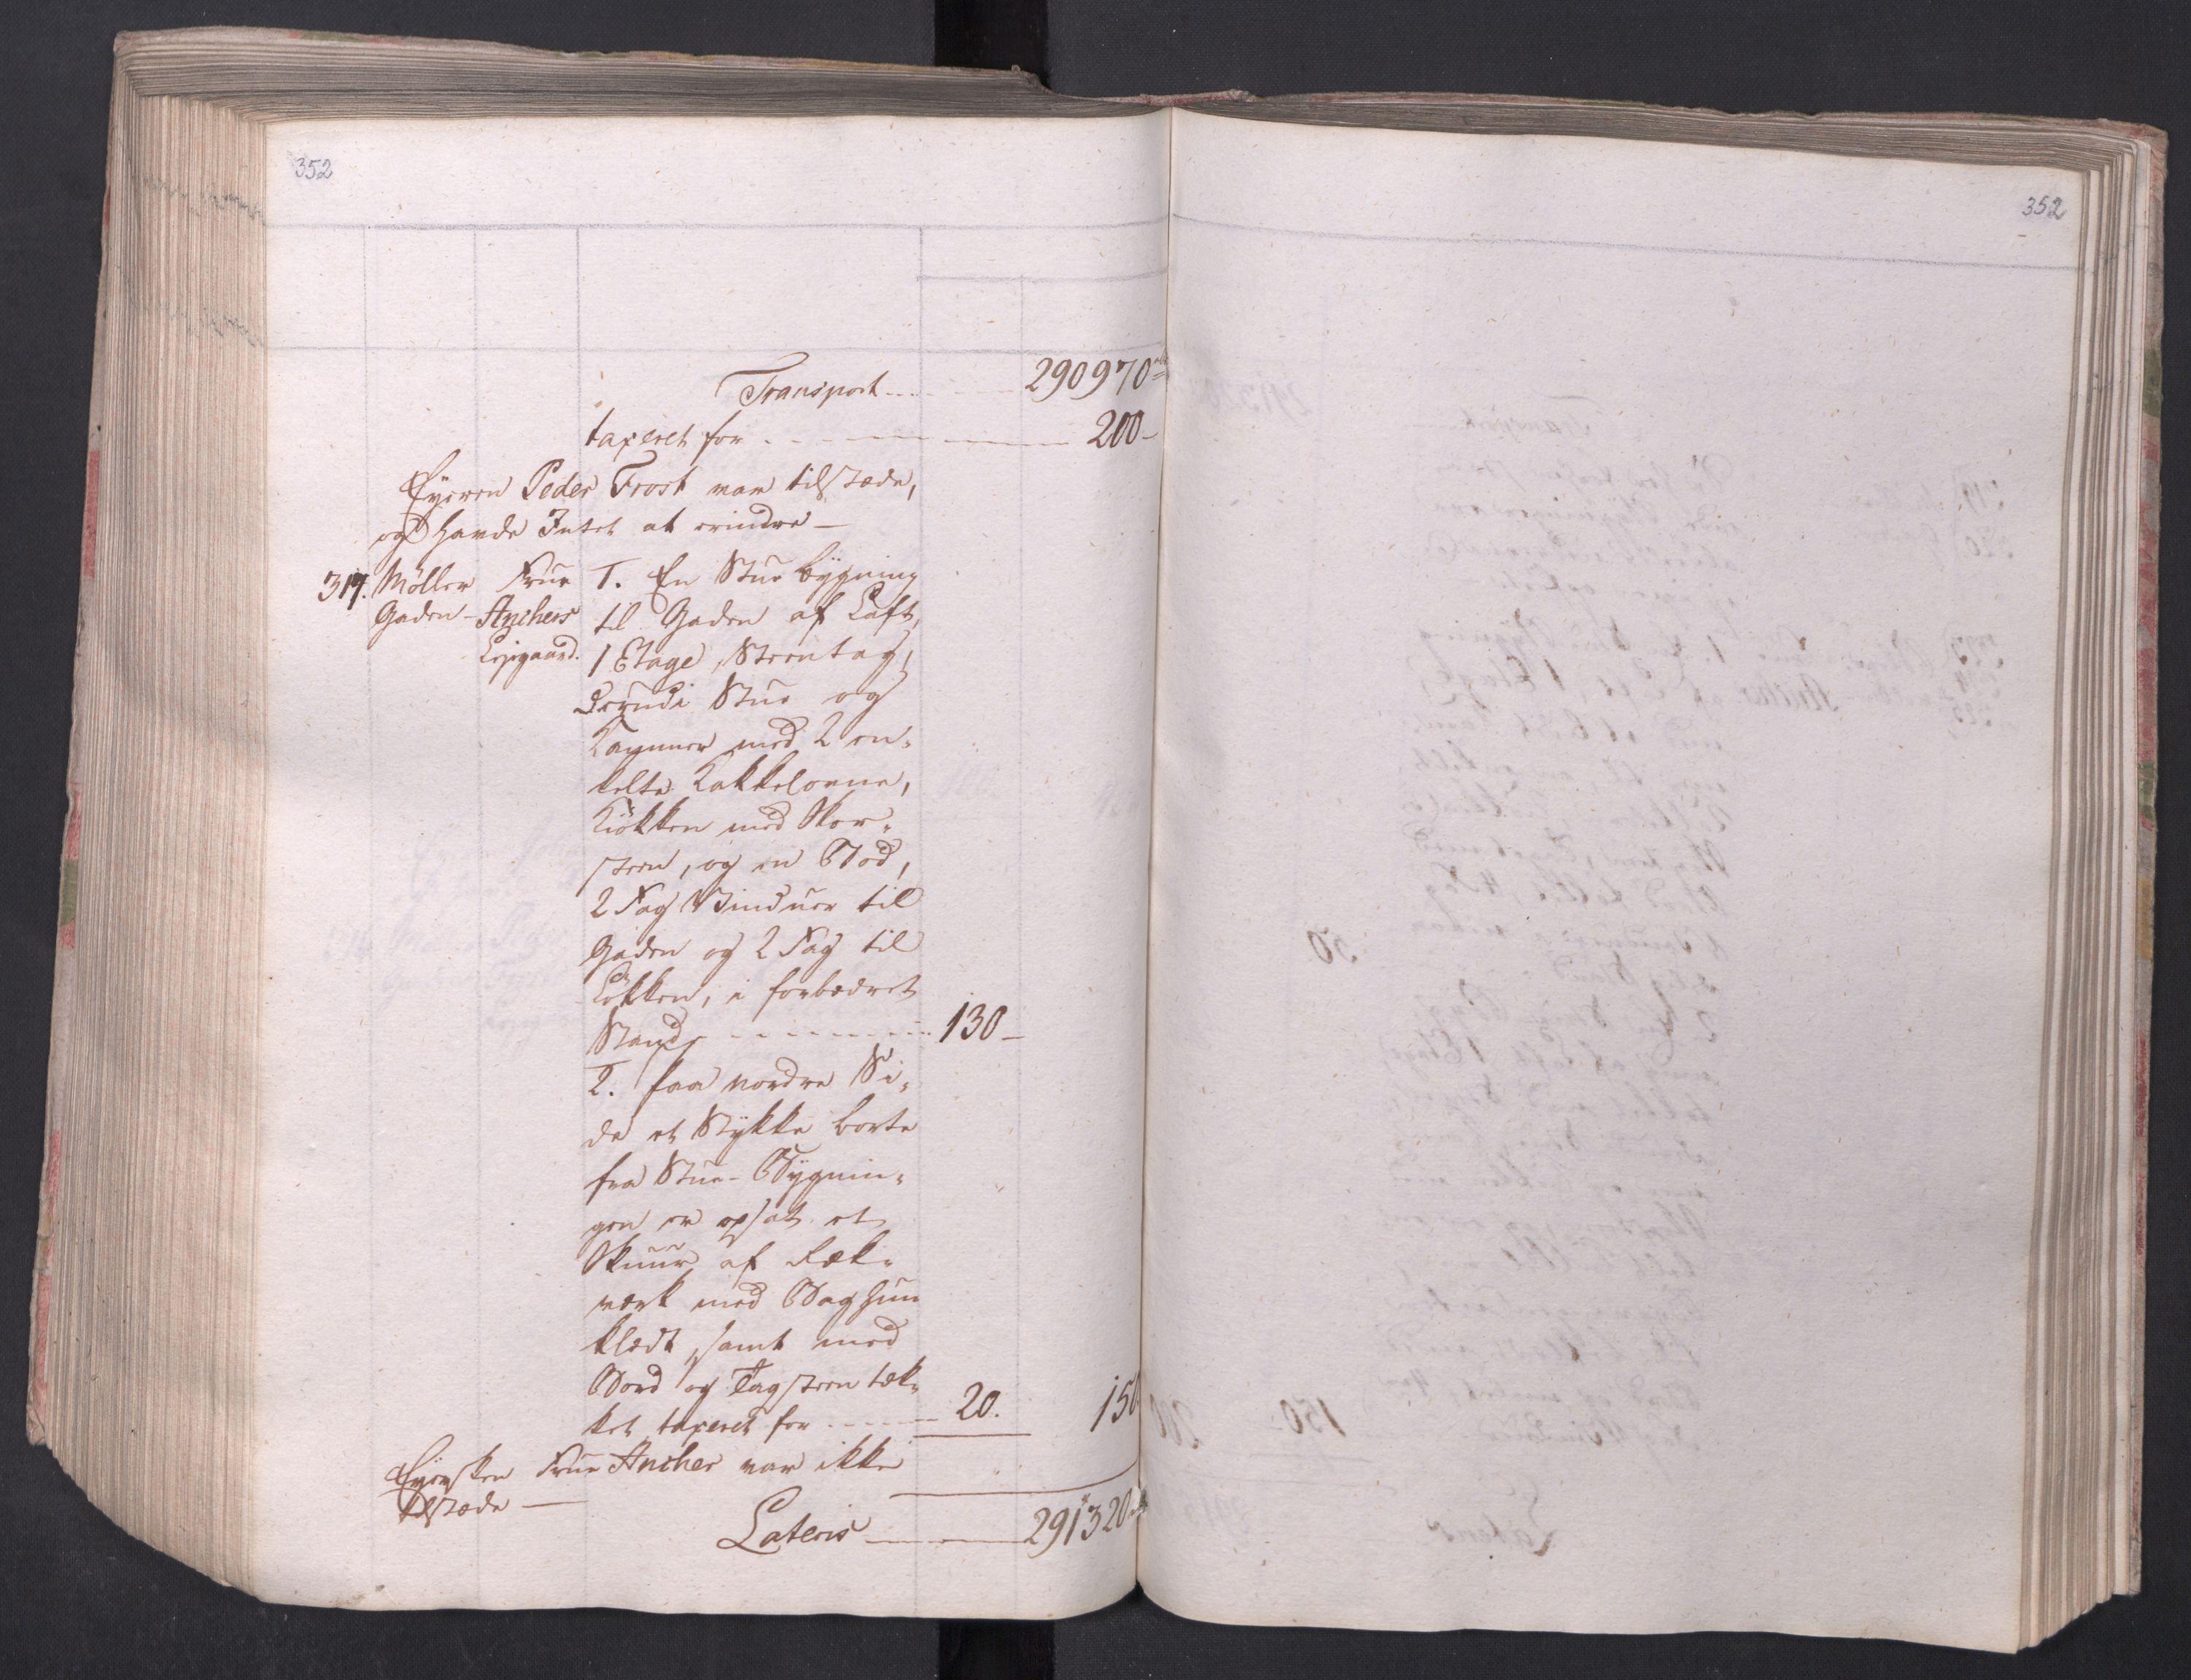 SAO, Kristiania stiftamt, I/Ia/L0015: Branntakster, 1797, s. 352